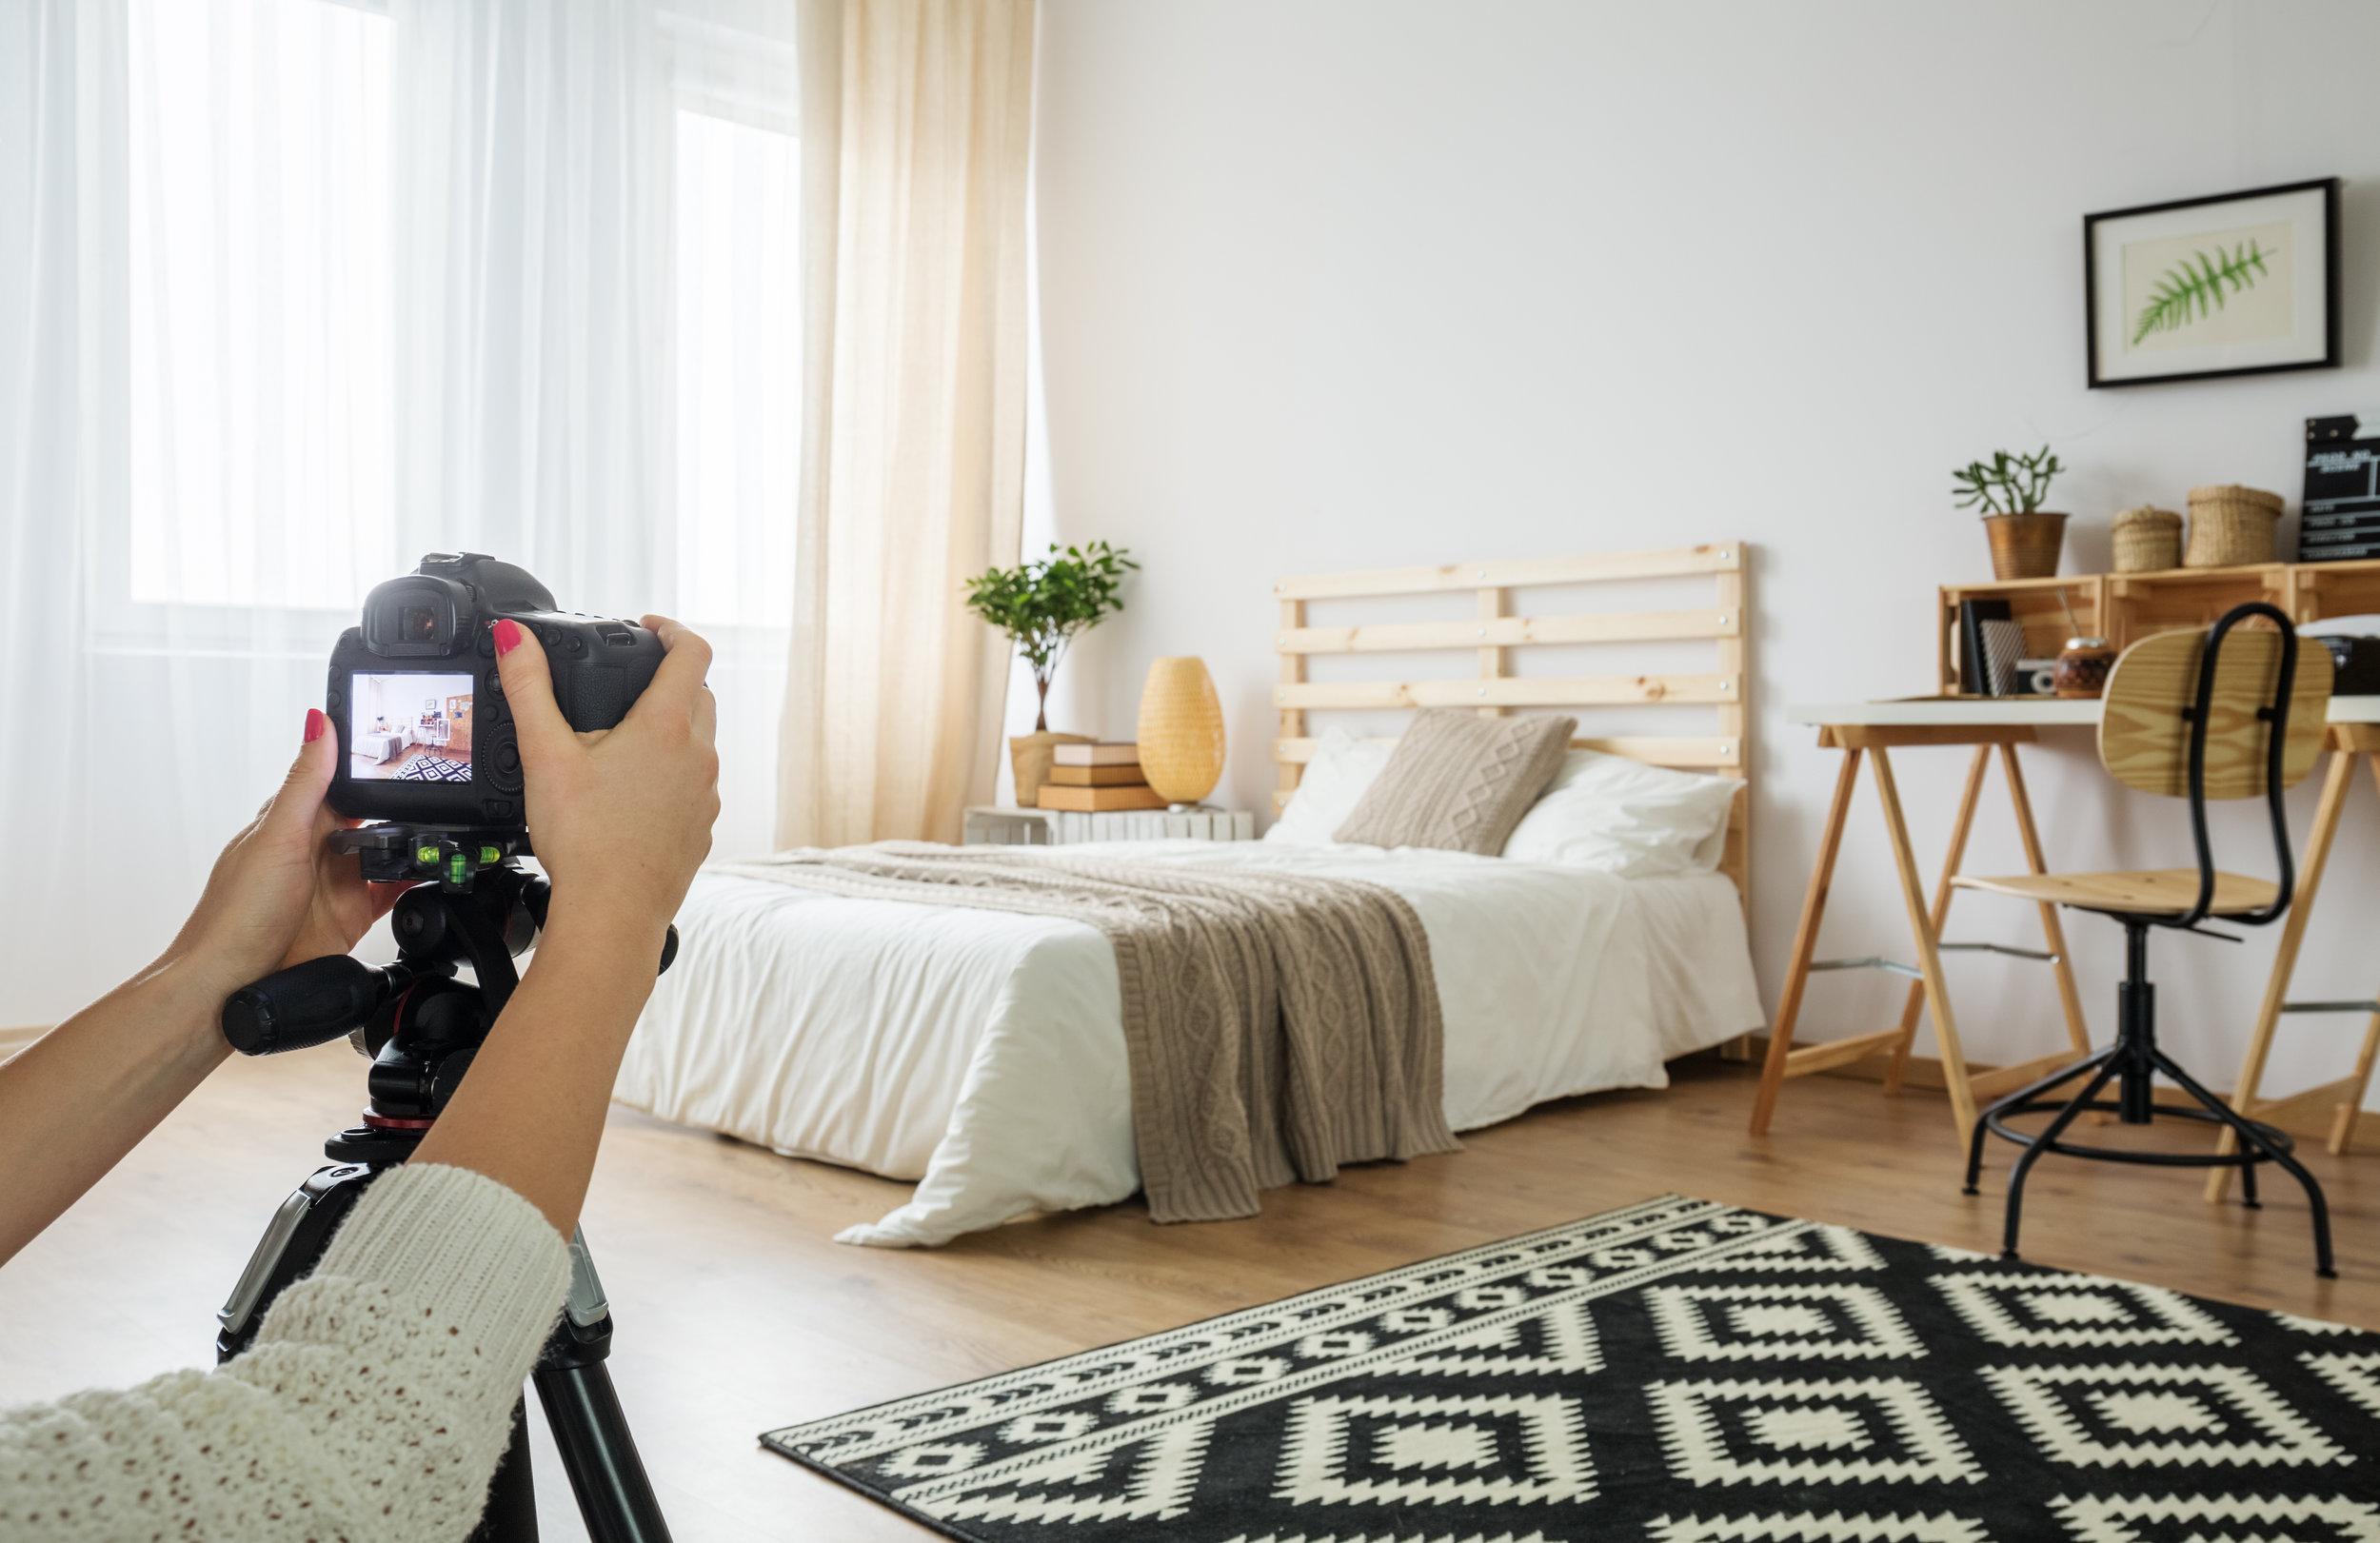 Taking photo of bedroom